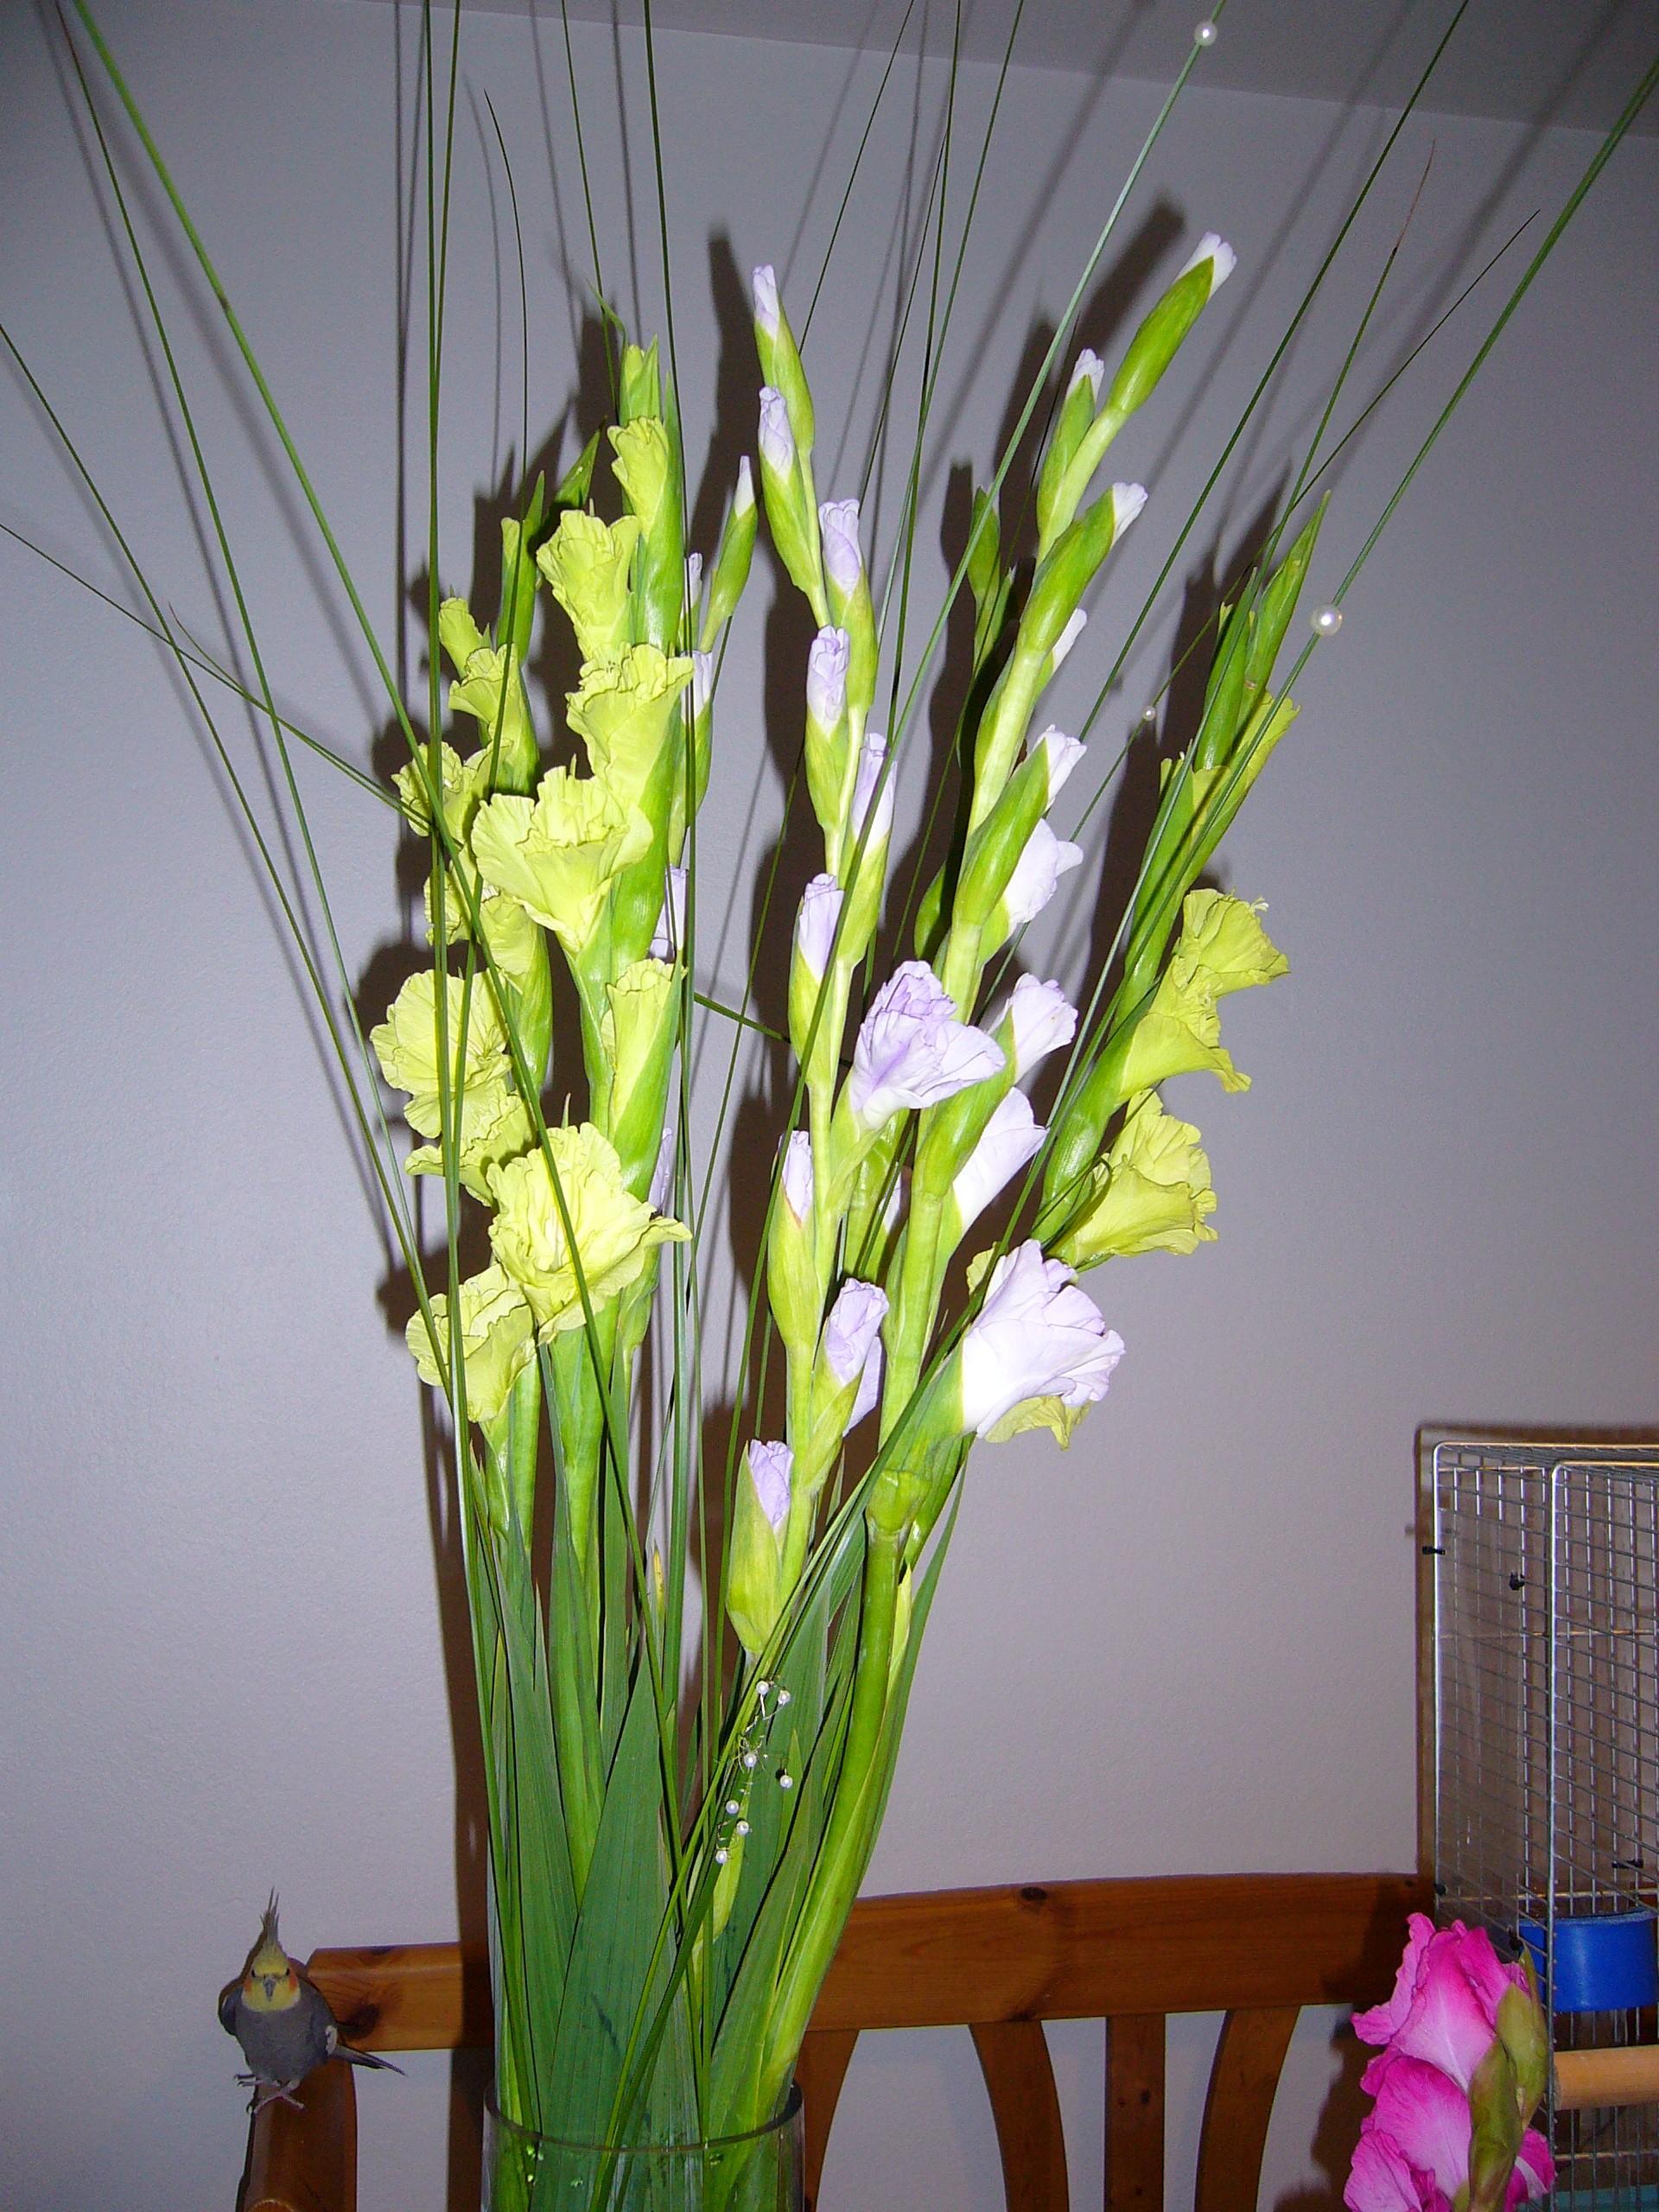 Gladiolus!